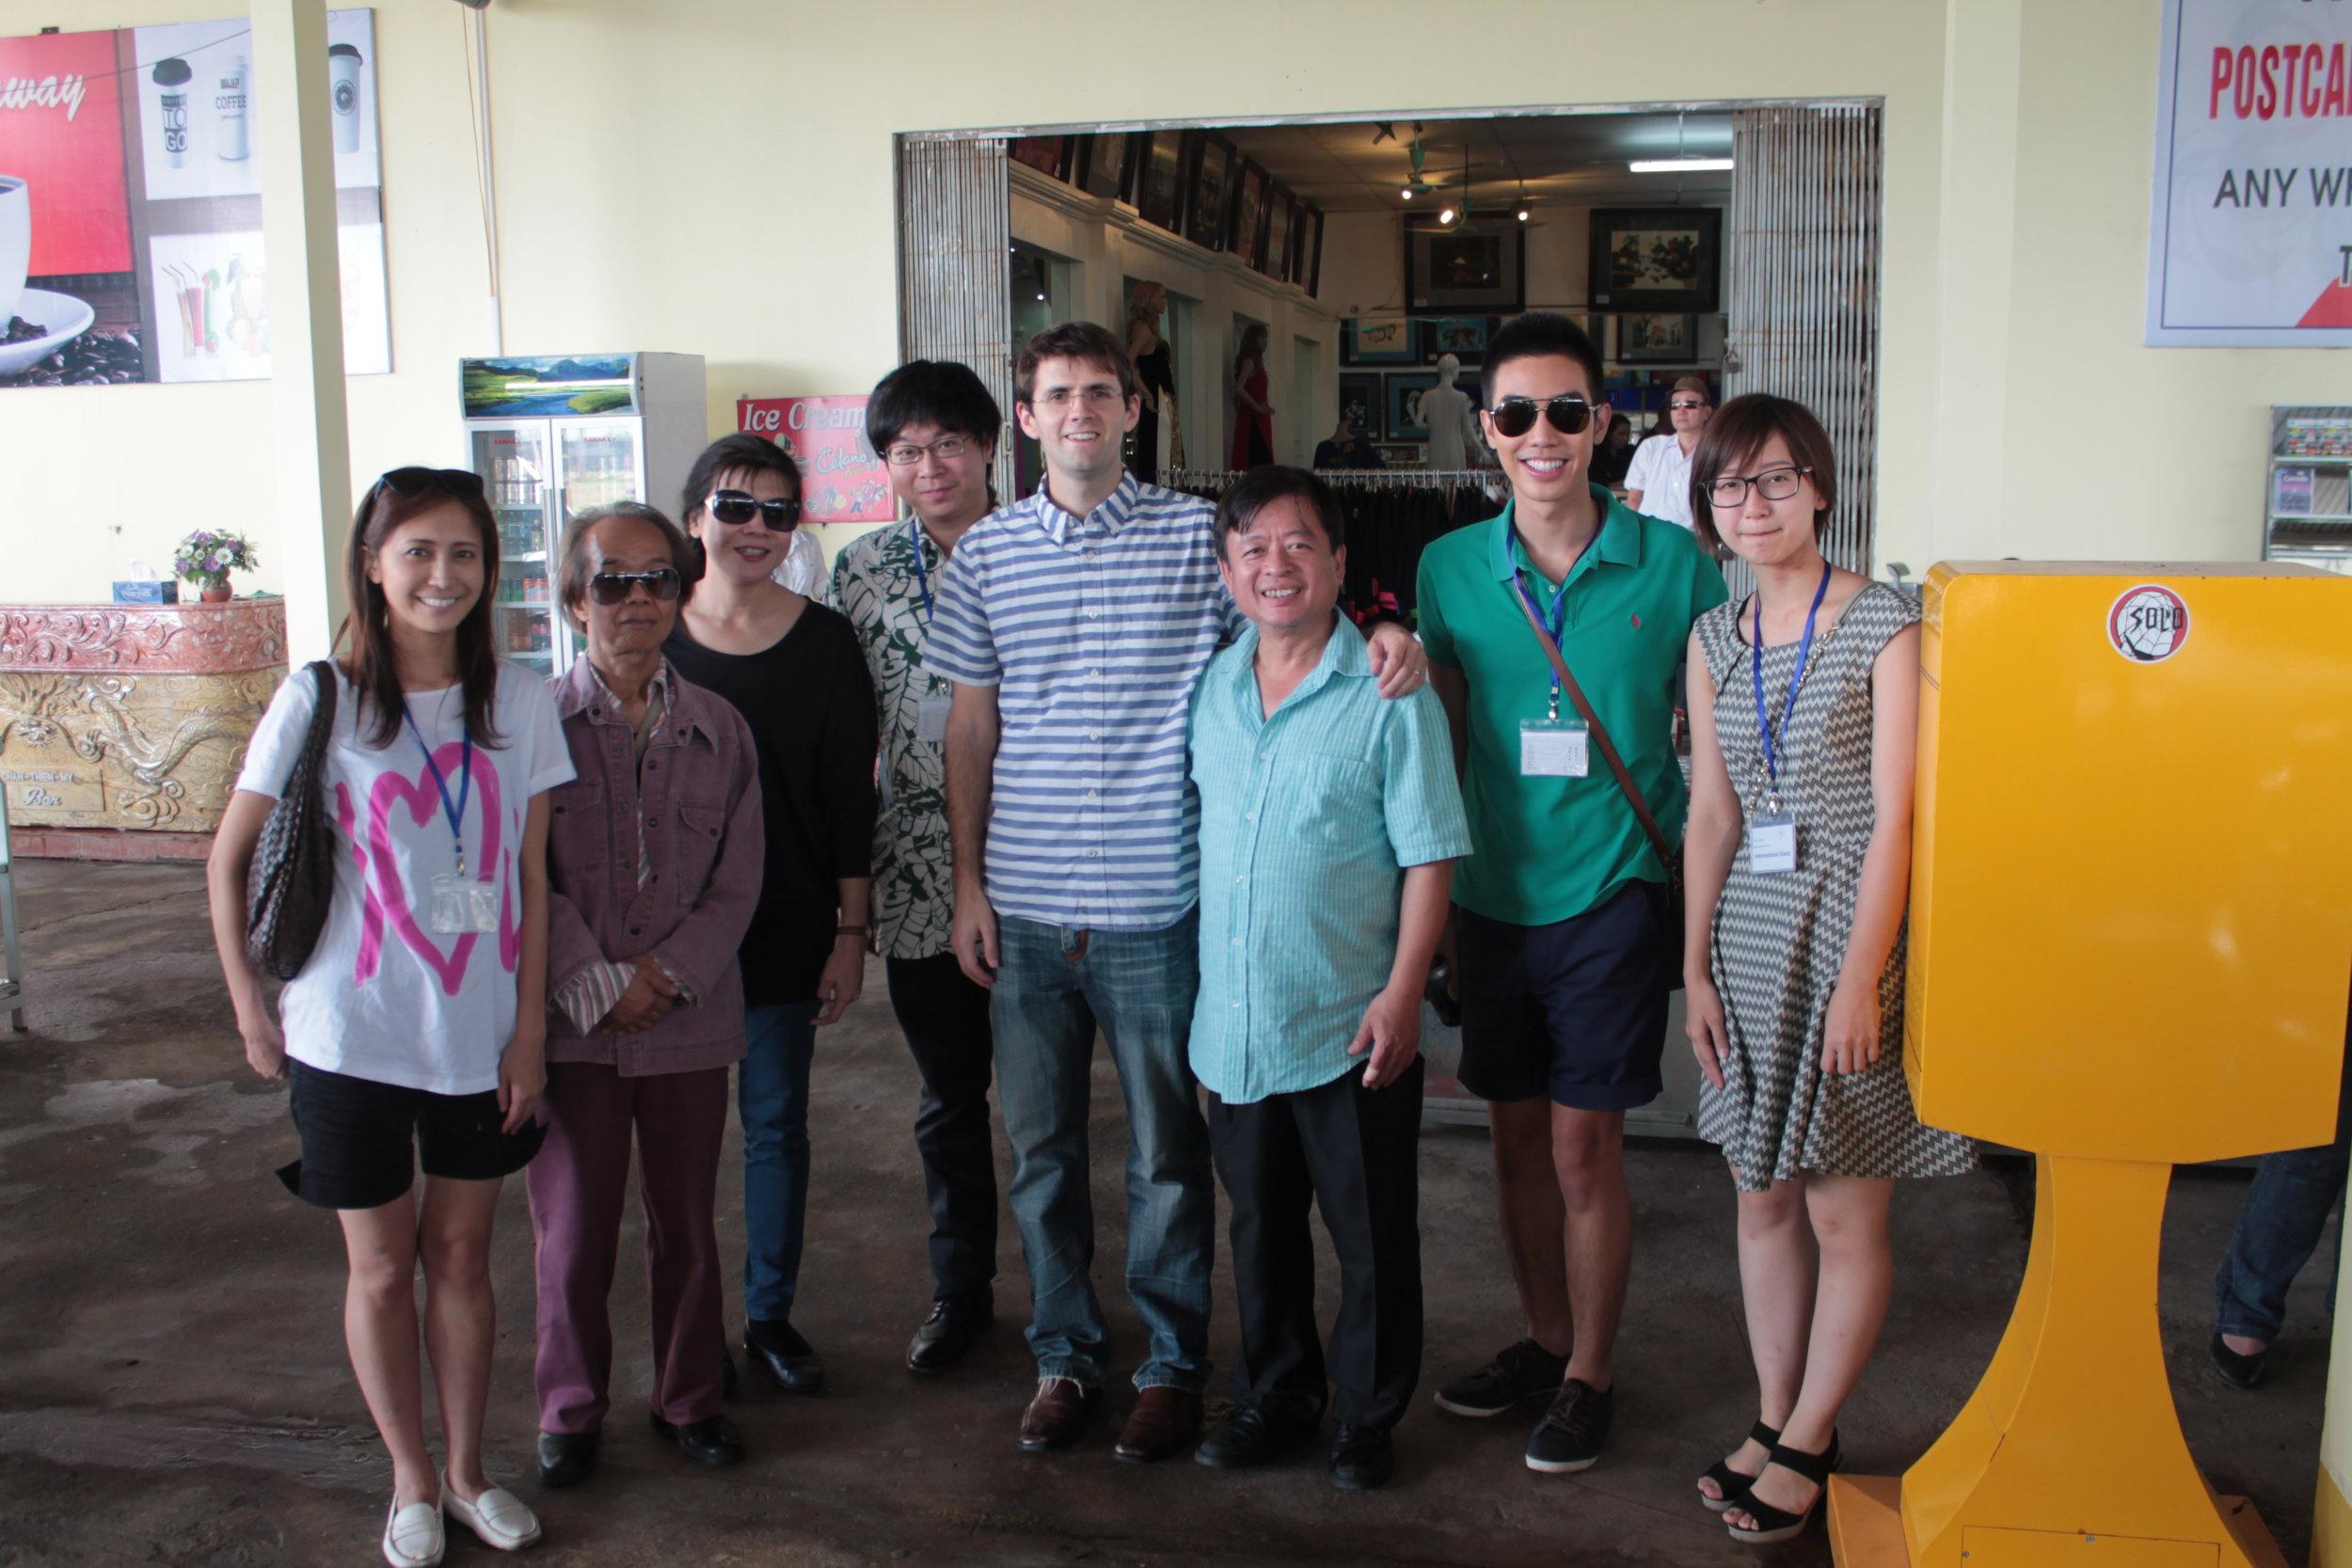 AANMI team members Sayo Kosugi, Kah Chun Wong, Rain Senavinin, and Ayane Sato pose during a roadside pit stop with composer Nguyễn Thiên Đạo and festival organizer and composer Đỗ Hồng Quân.